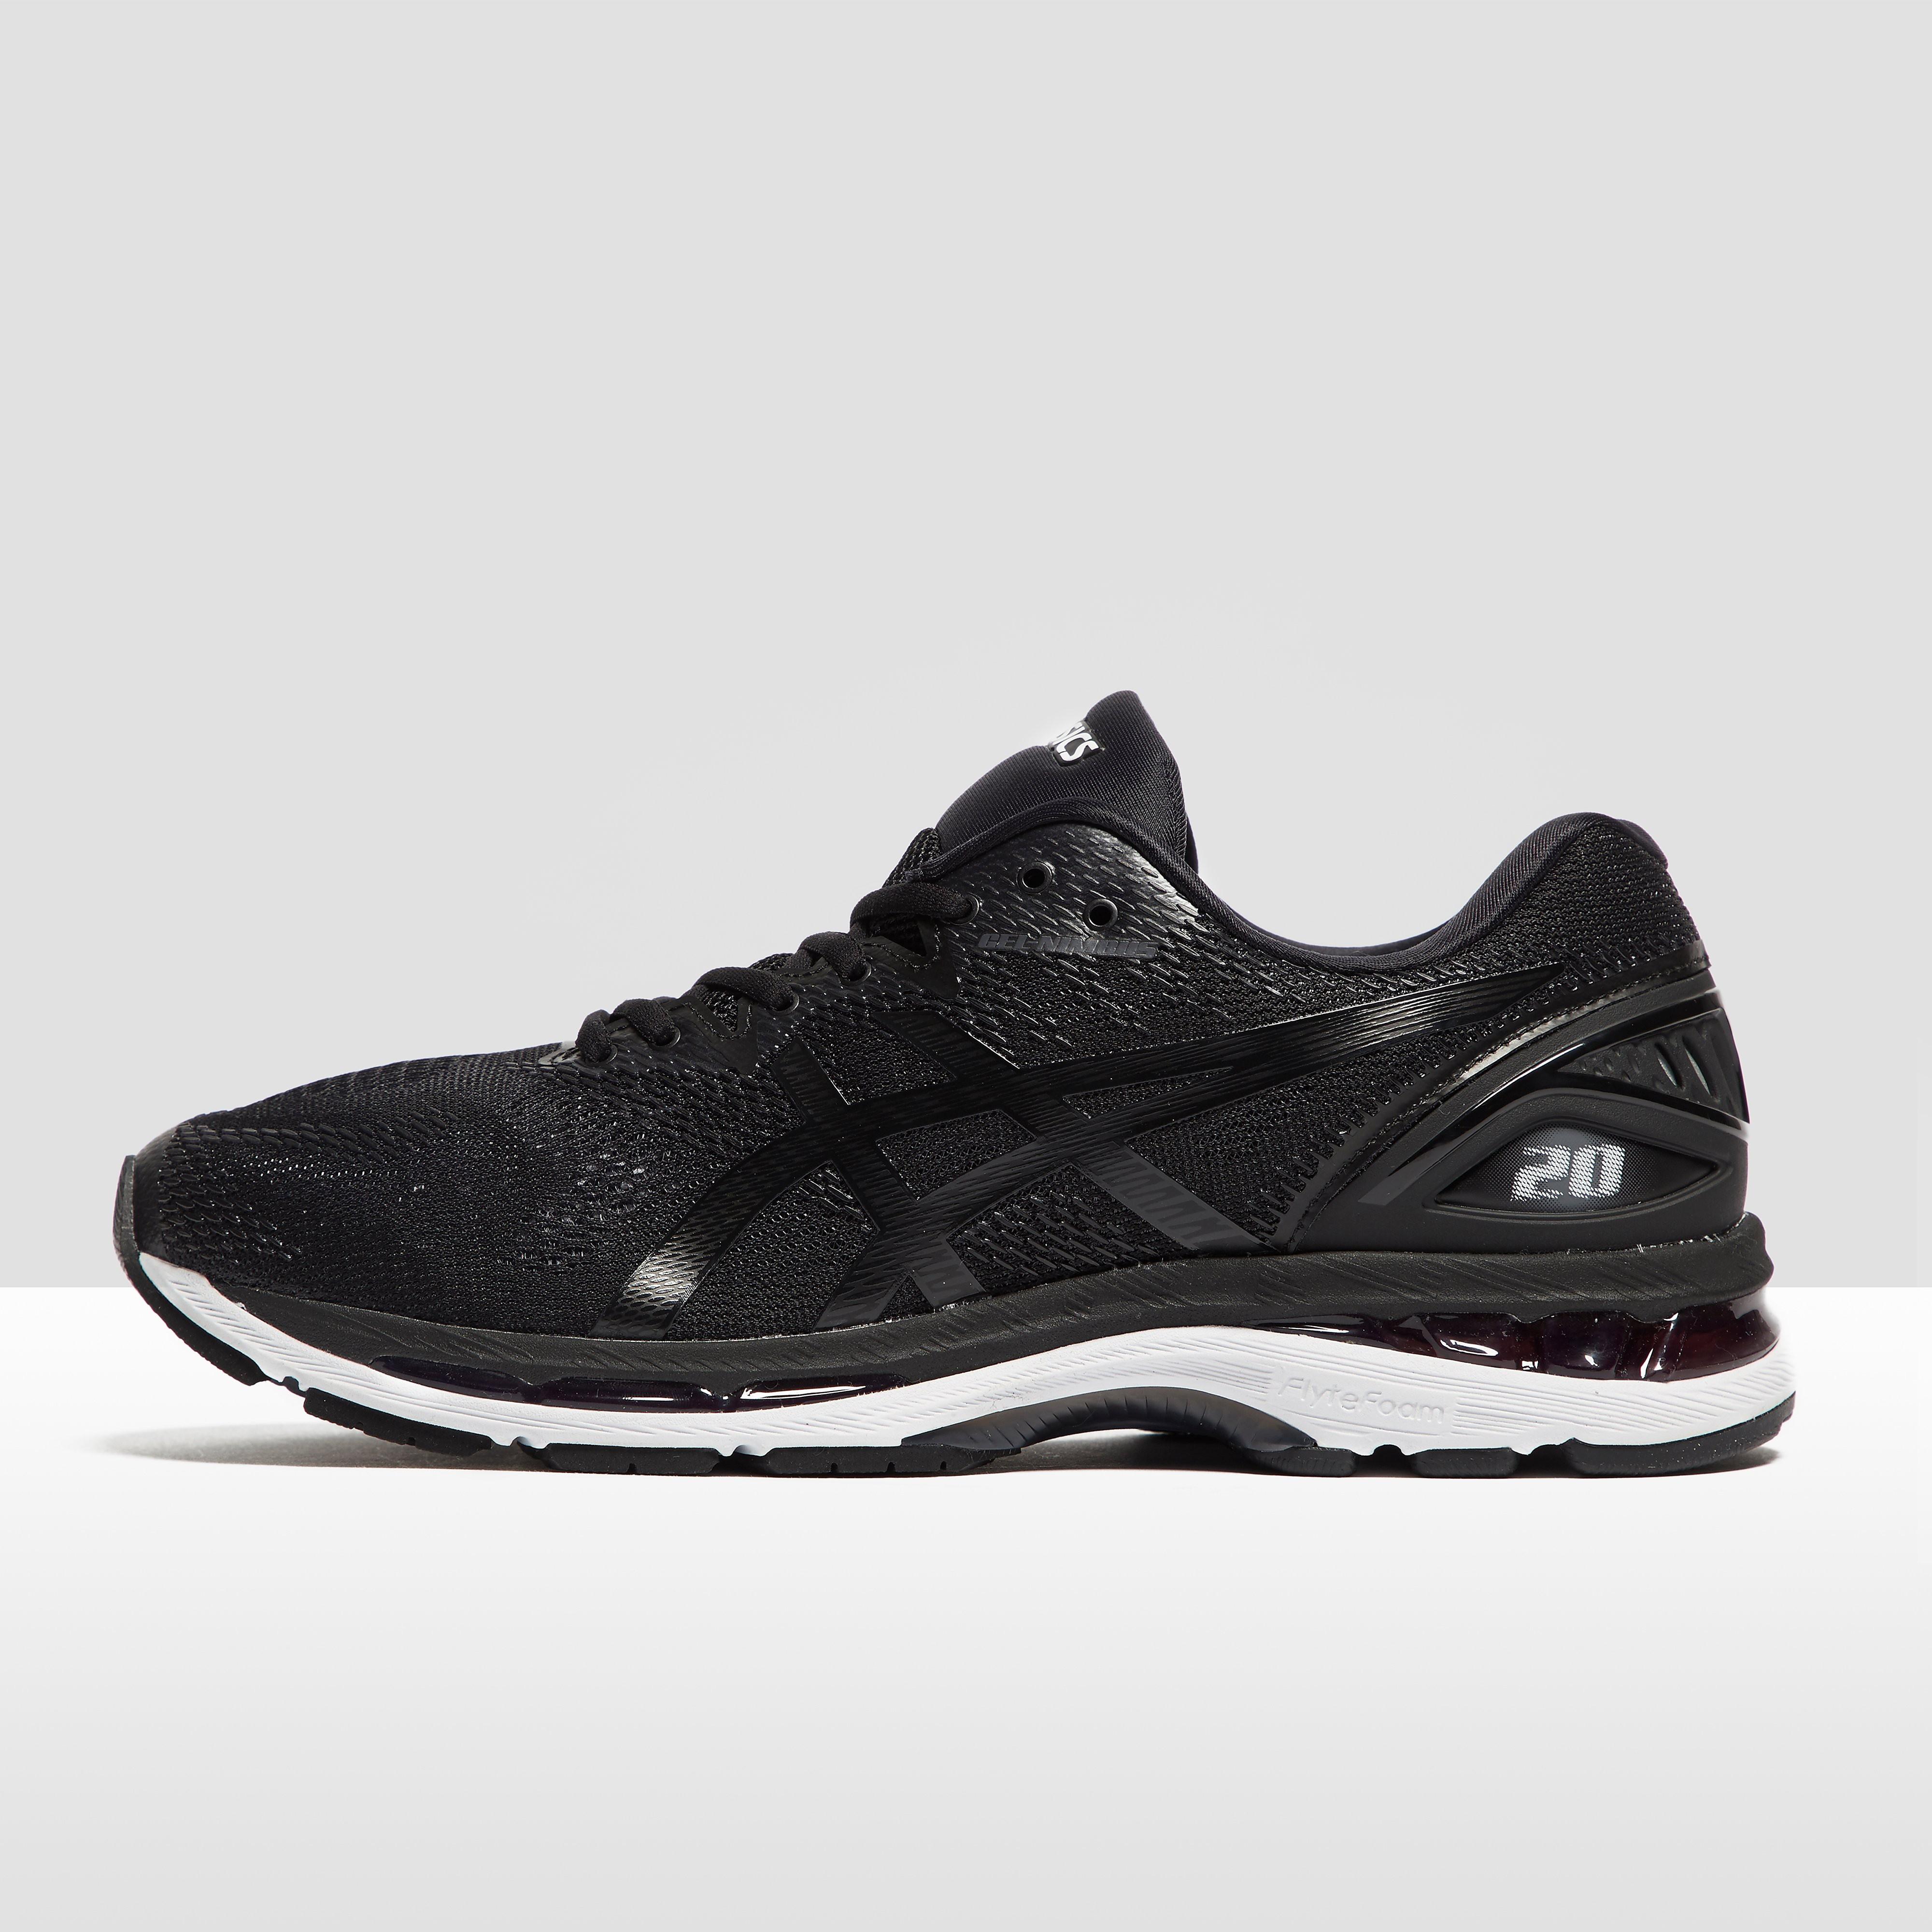 Men's ASICS Gel-Nimbus 20 Running Shoes - Black, Black